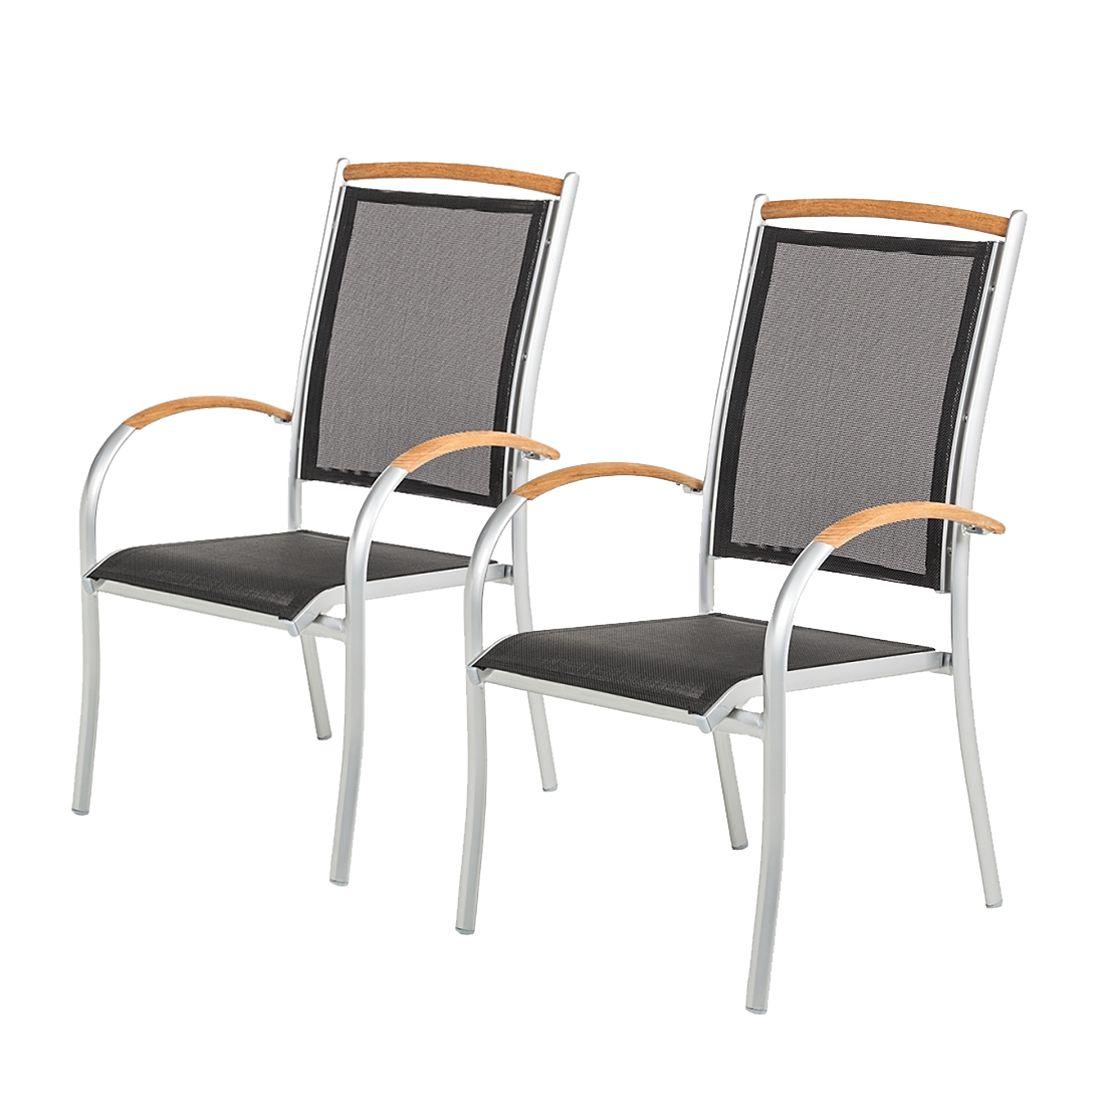 stapelstuhl varu 2er set aluminium silber textil schwarz mehr garten m bel24. Black Bedroom Furniture Sets. Home Design Ideas